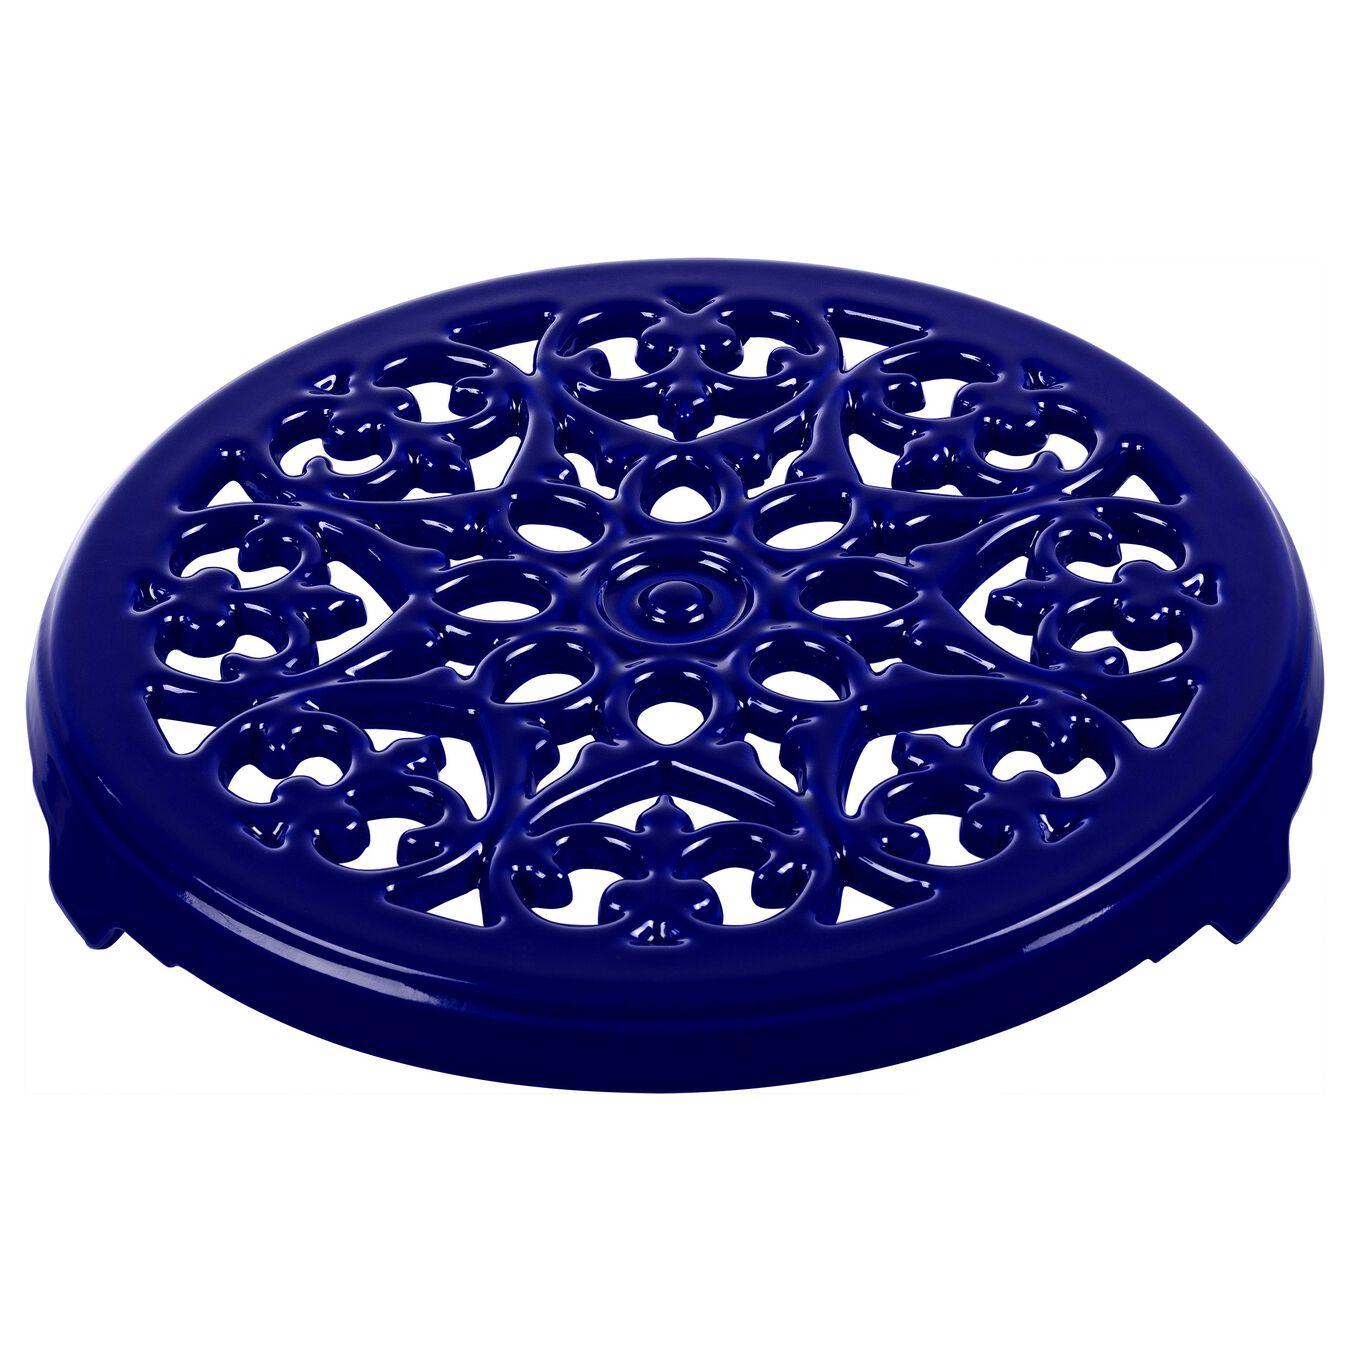 23 cm round Cast iron Trivet, lily decal, dark-blue,,large 1